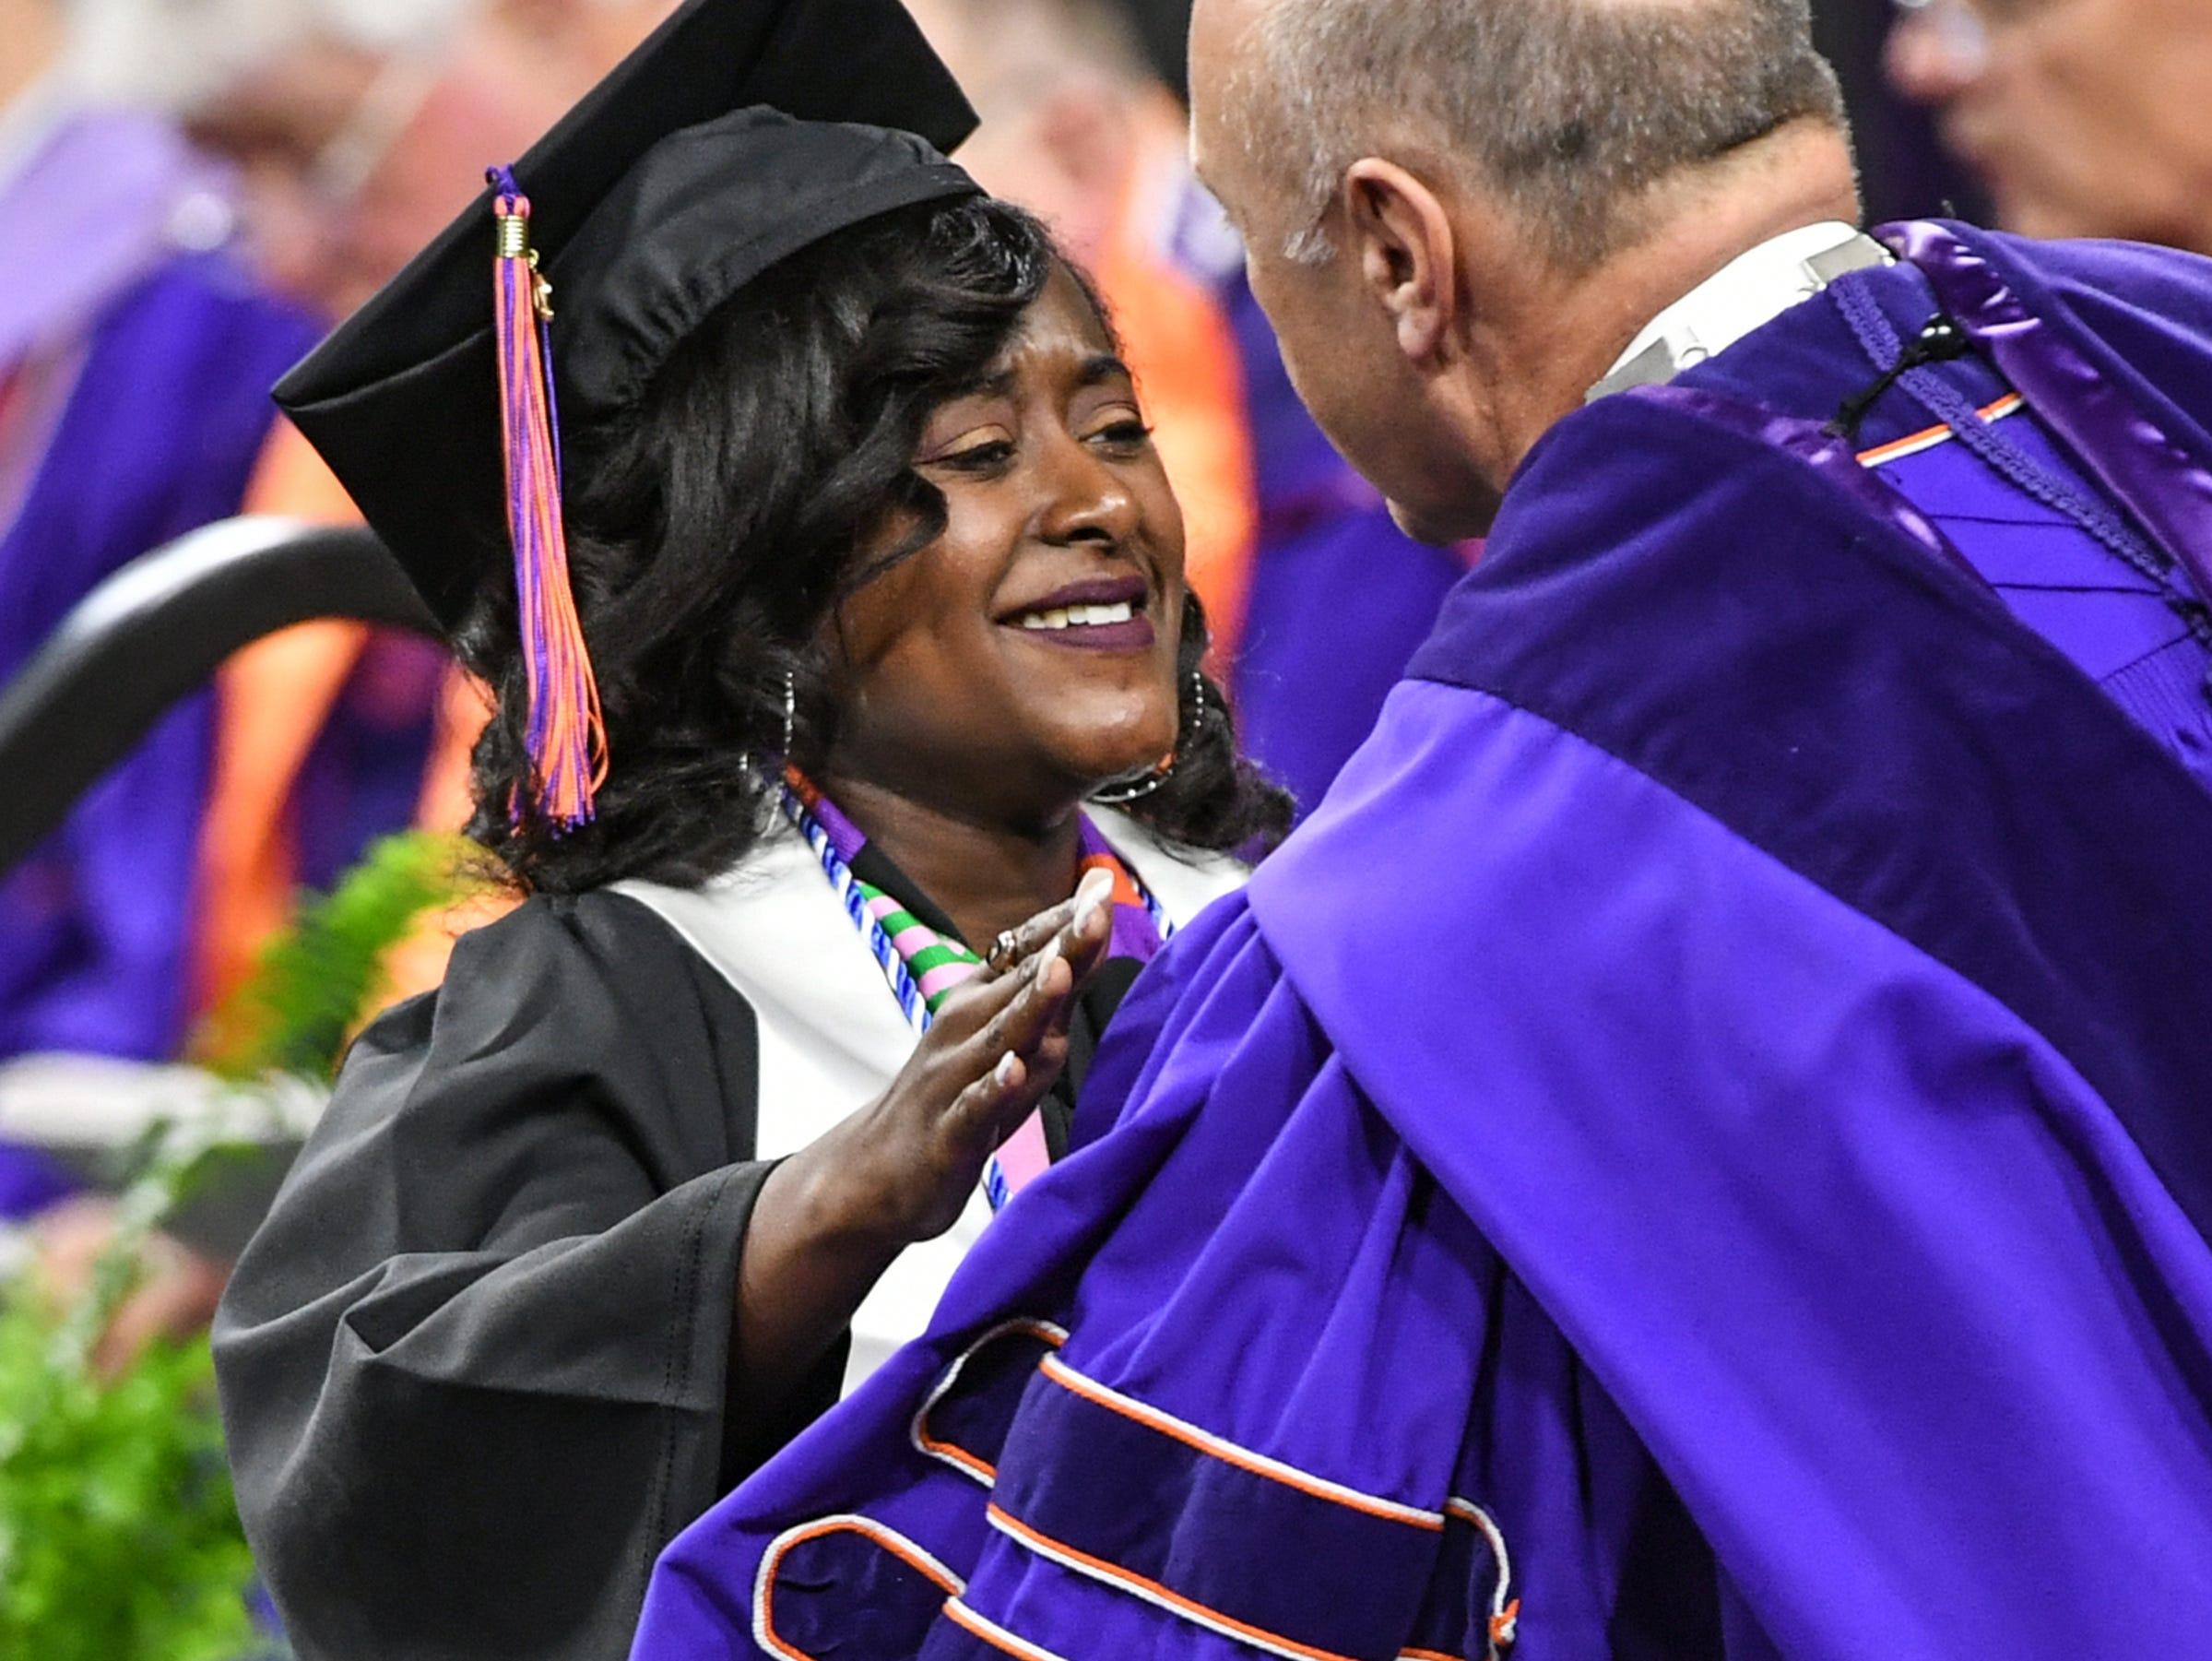 Ja'Tori Myers hugs President Jim Clements after getting her nursing degree during Clemson University commencement ceremonies in Littlejohn Coliseum in Clemson Friday, May 10, 2019.